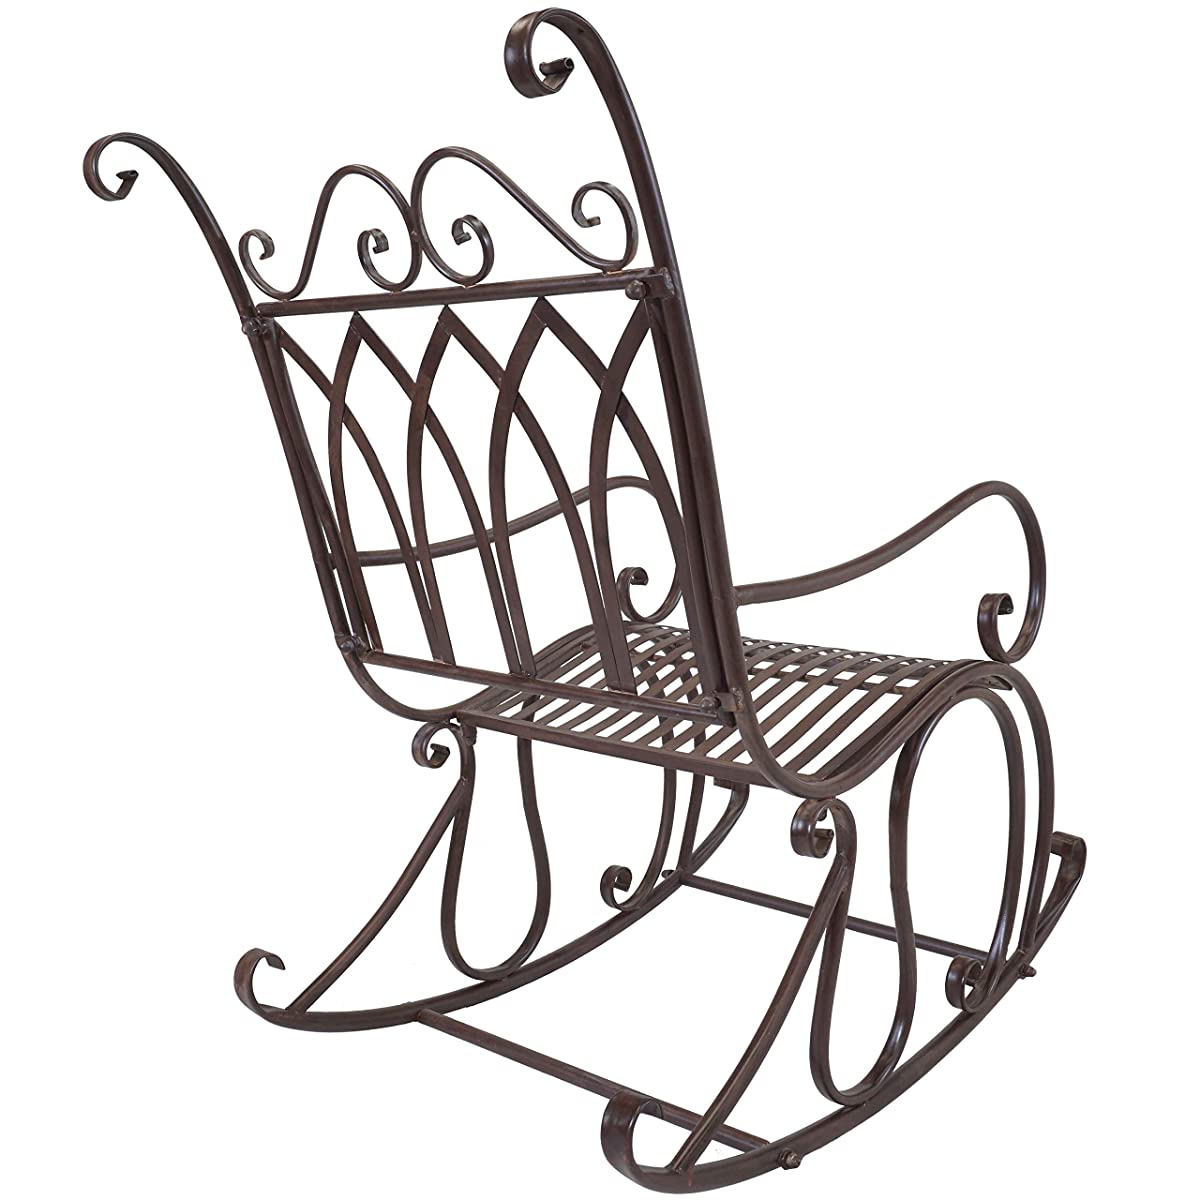 Titan Outdoor Metal Rocking Chair Porch Patio Garden Seat Deck Decor